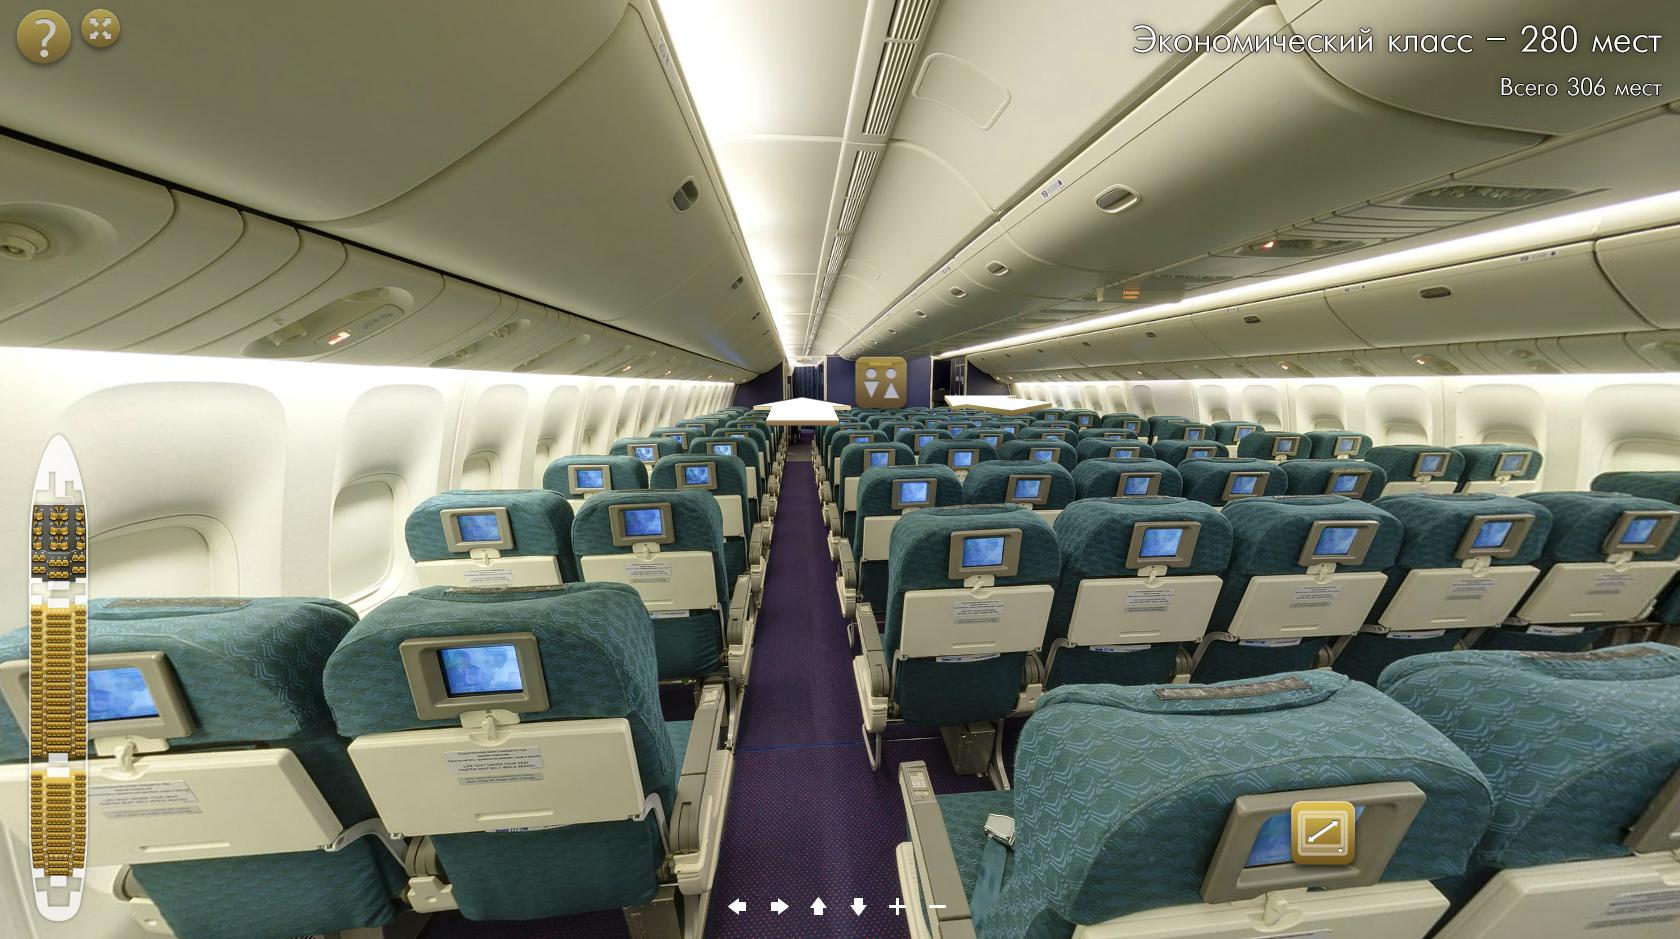 Боинг 777 200 схема салона лучшие места фото 216